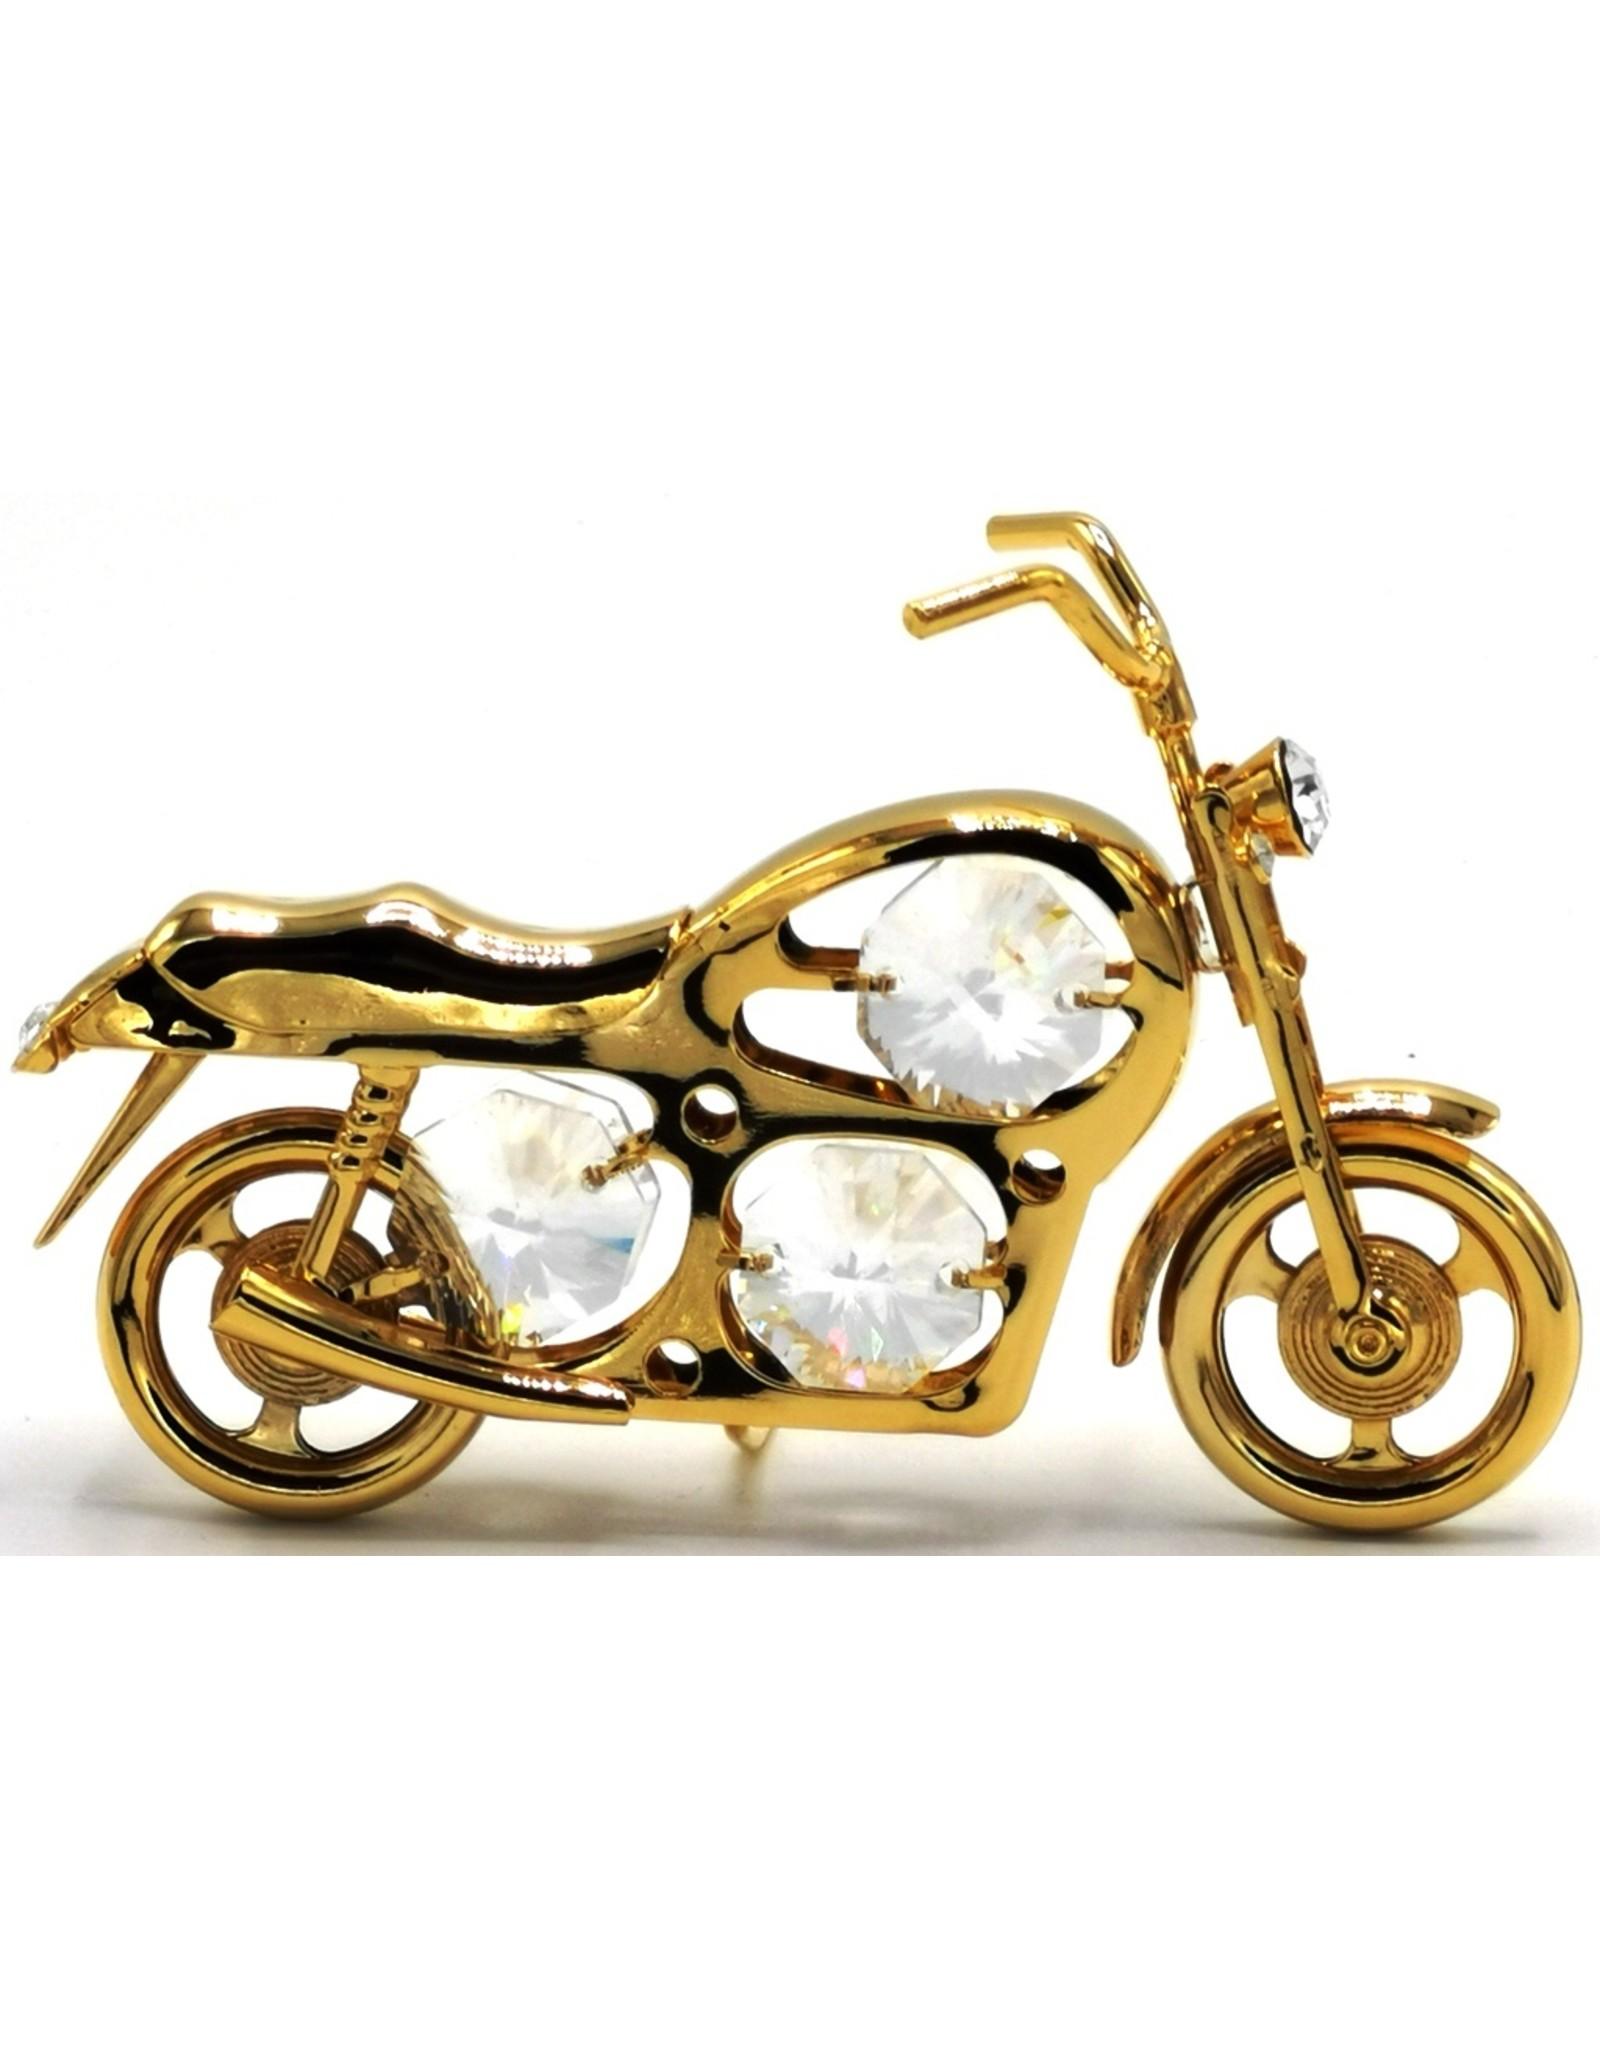 Crystal Temptations Miscellaneous - Miniatuur Motor - verguld en met Swarovski